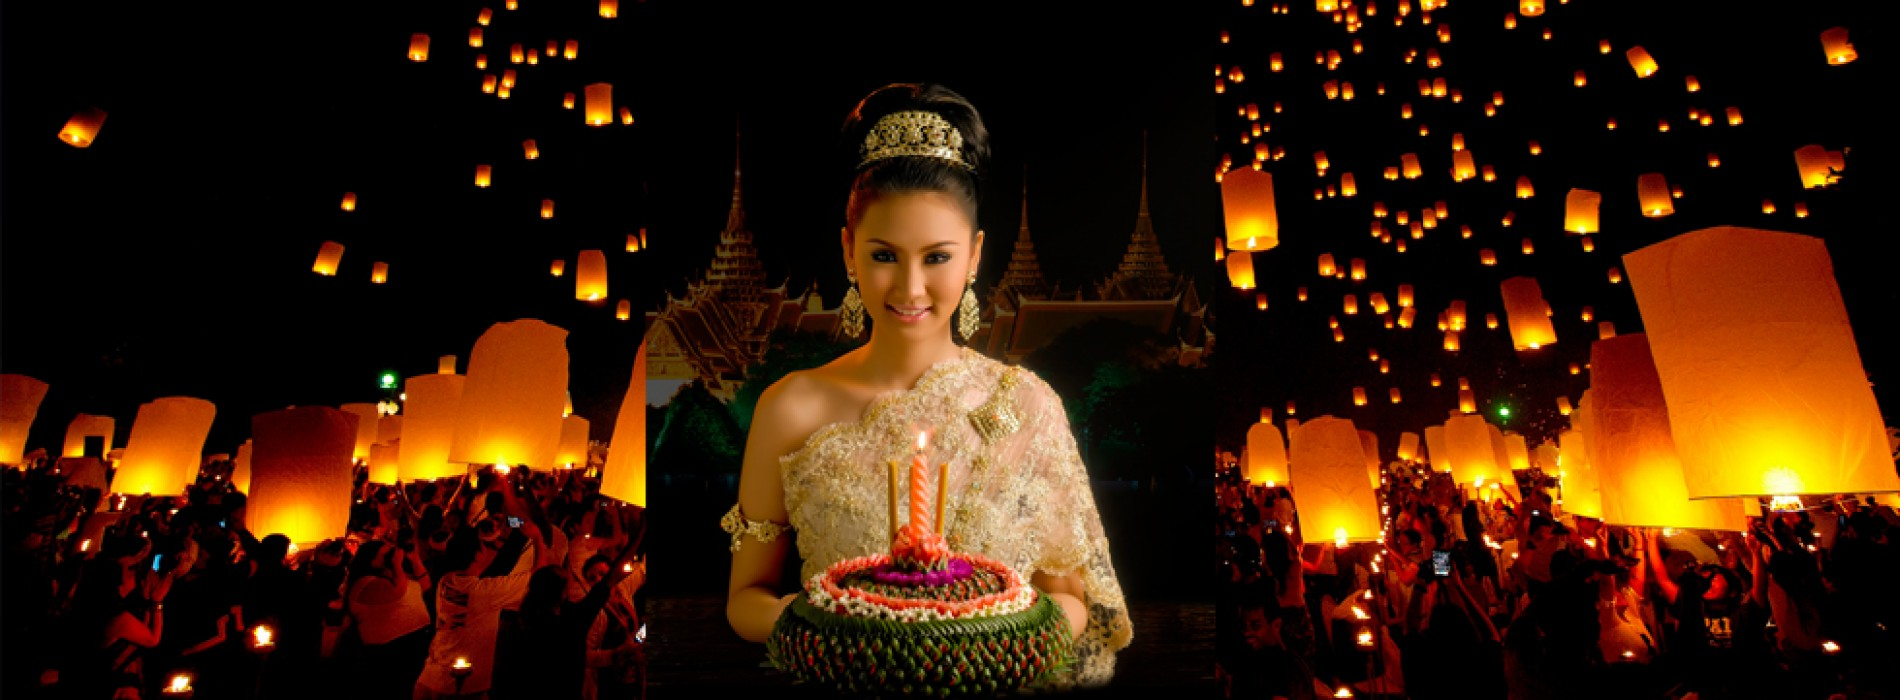 Thailand to celebrate Loi Krathong on November 3, 2017